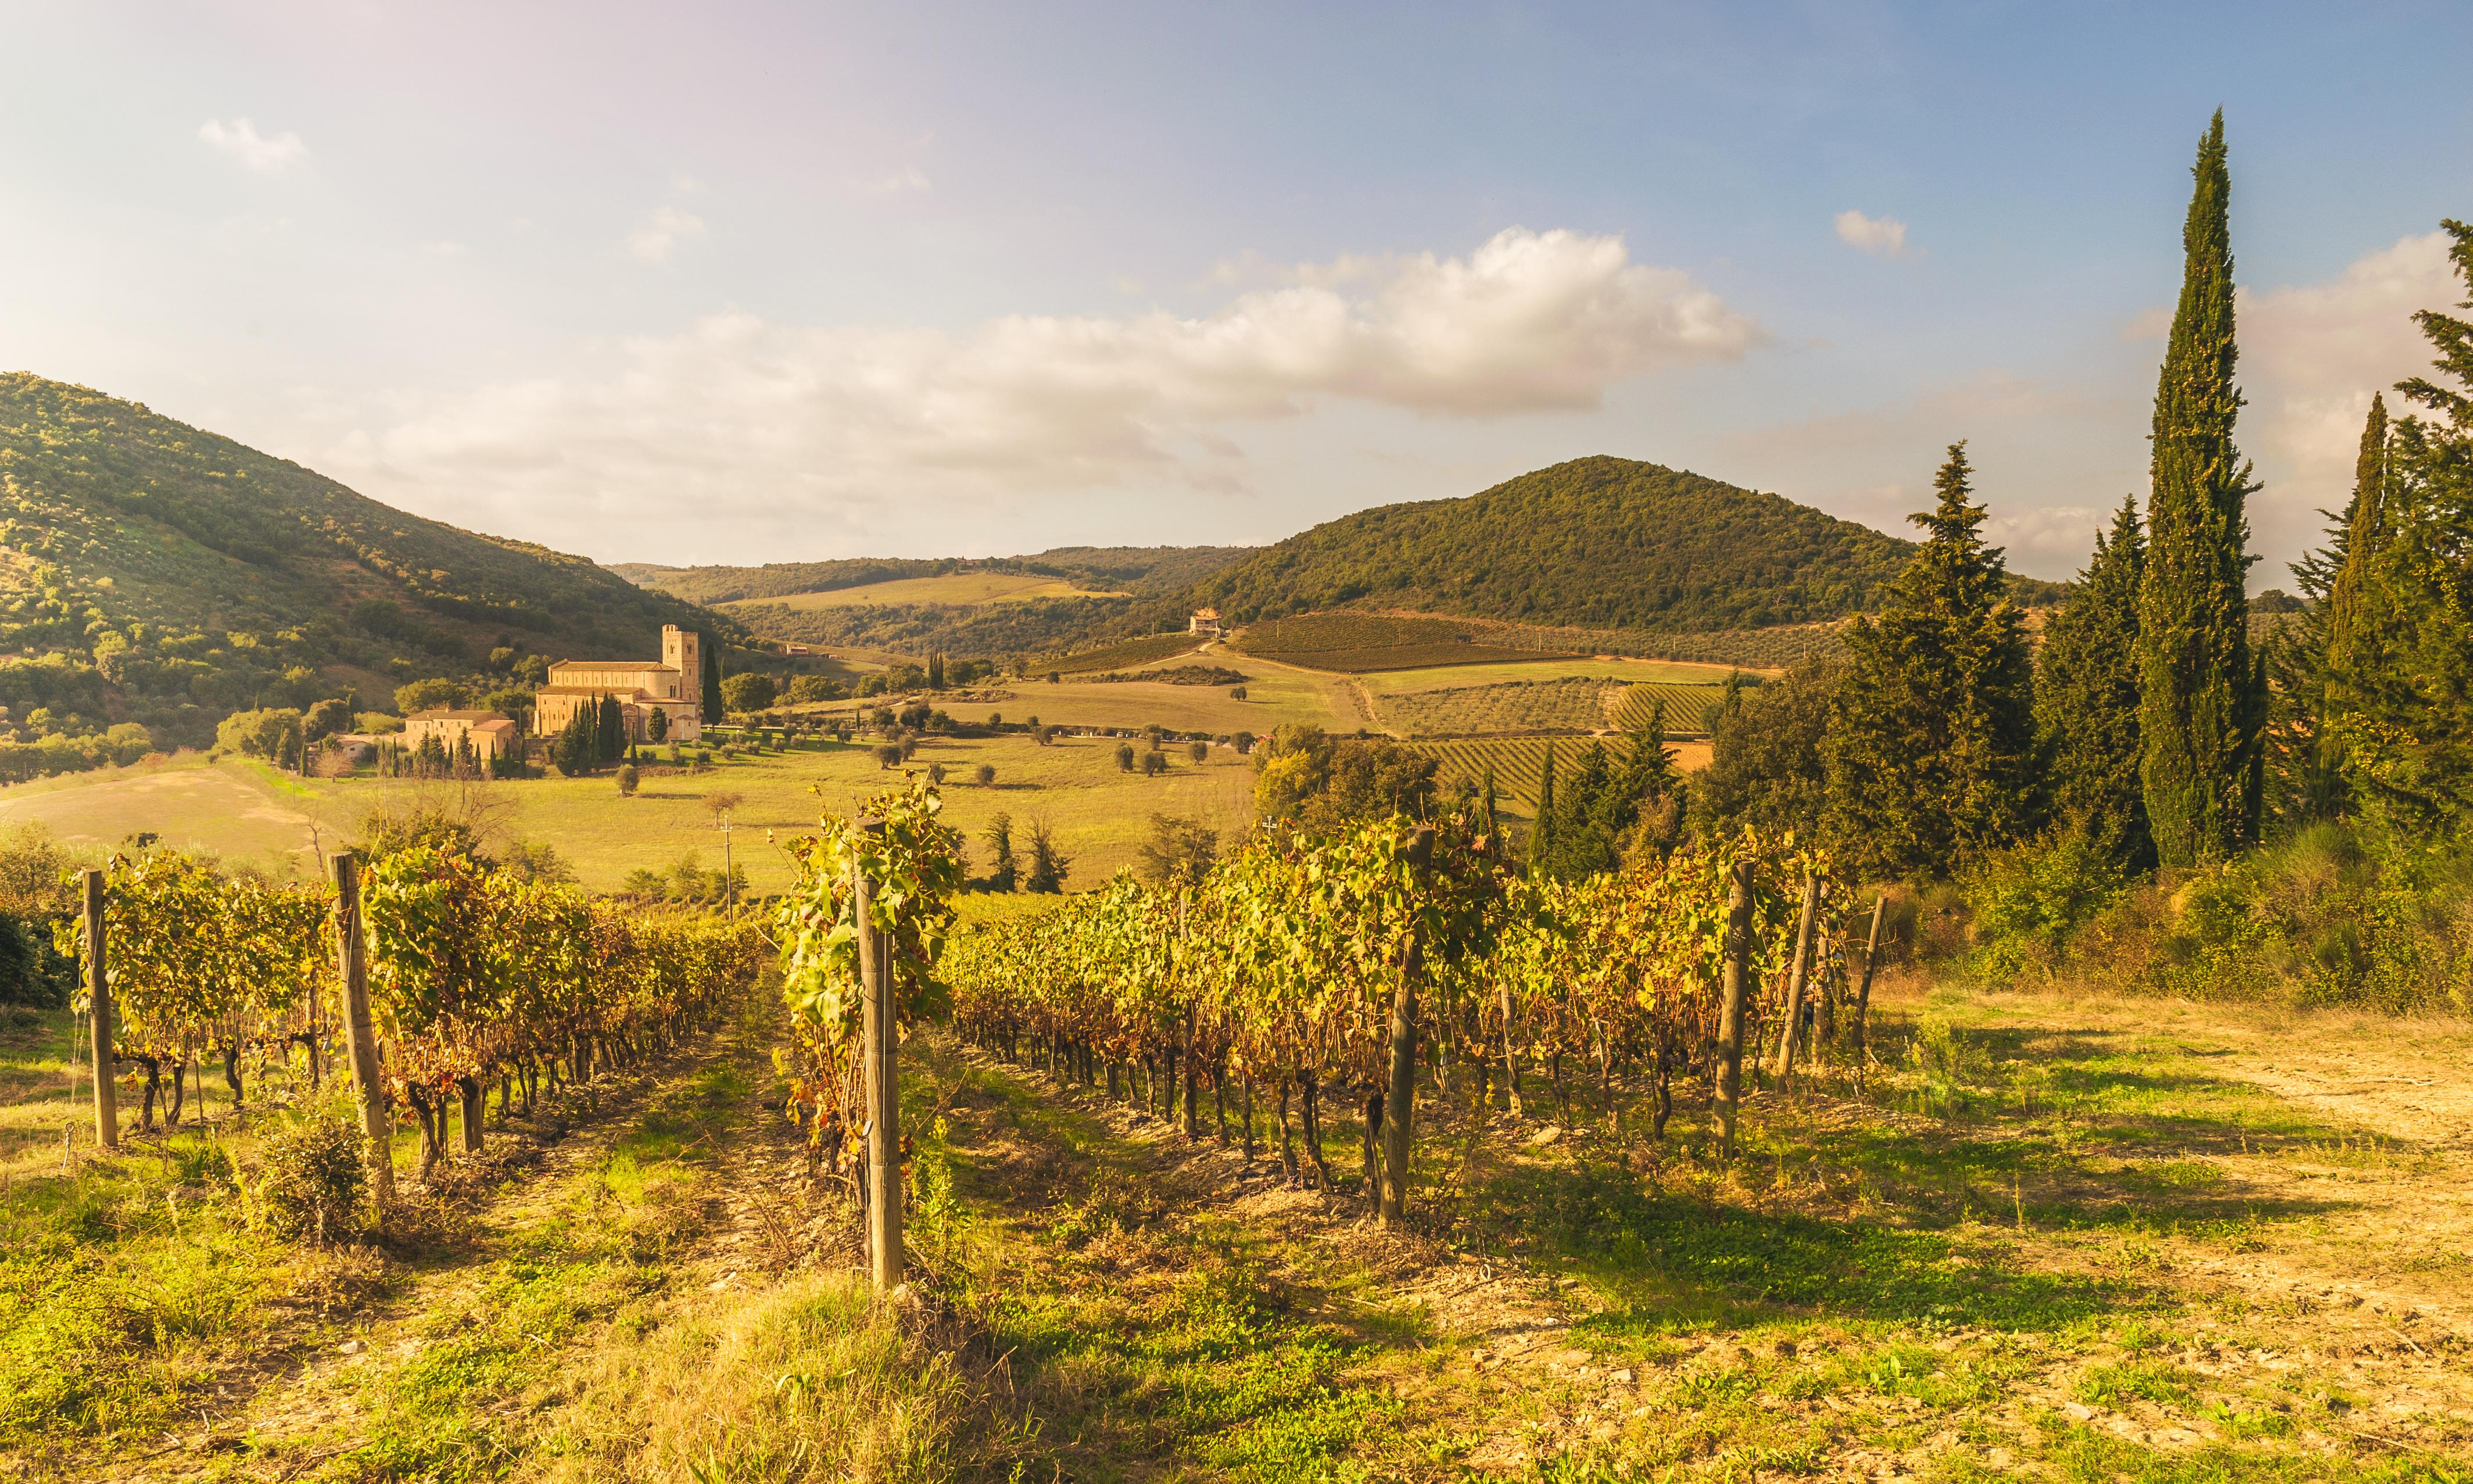 The Da Vinci road: walking through Tuscany